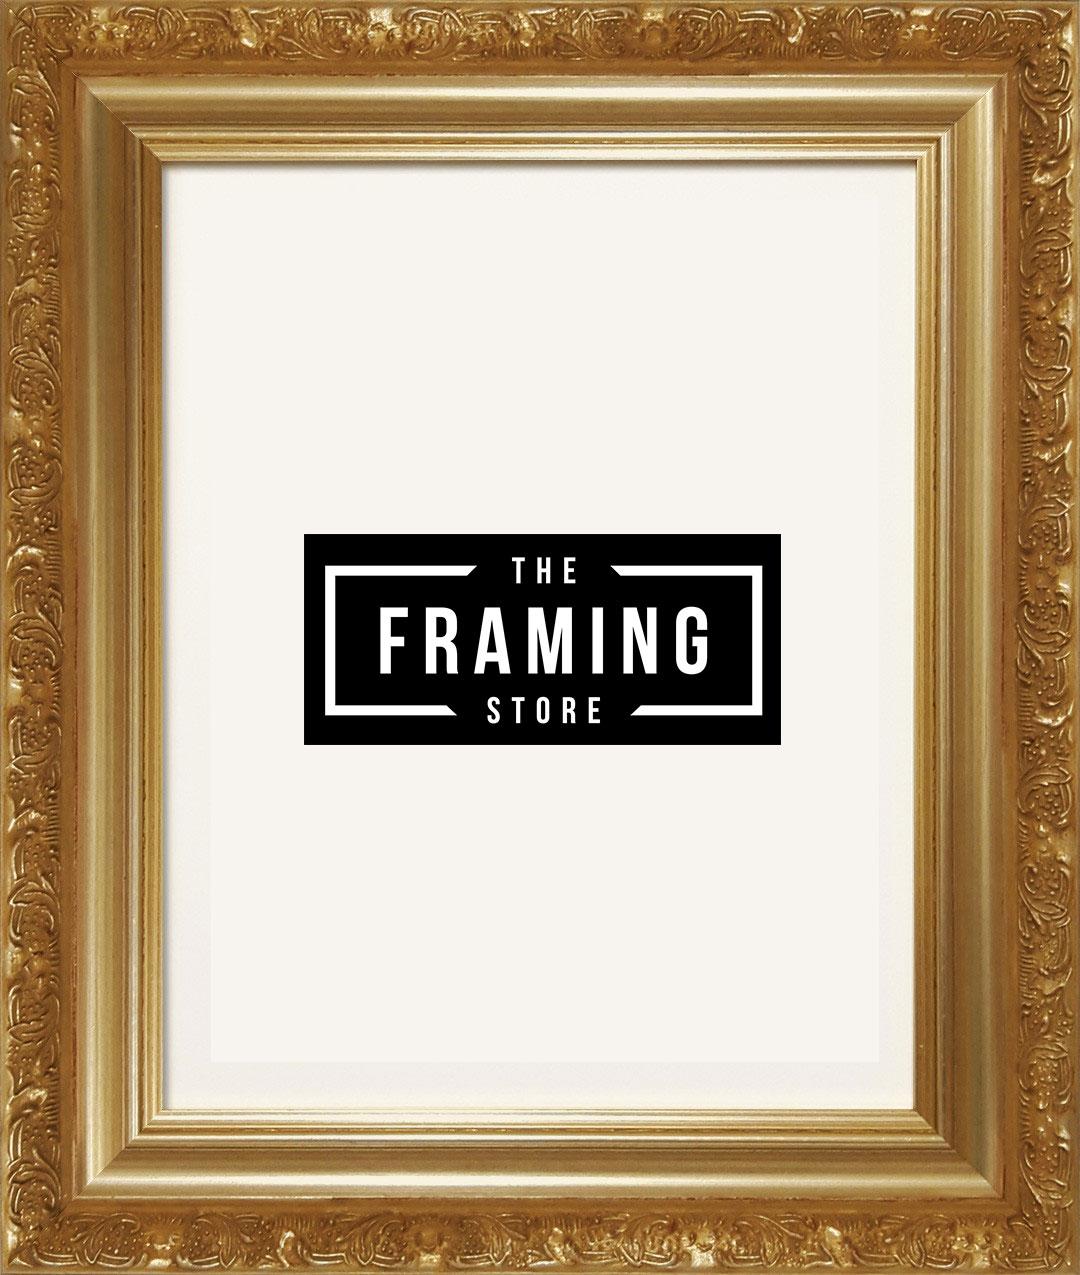 Australian made 8x10 Gold coloured fancy frame (203mm x 254mm)